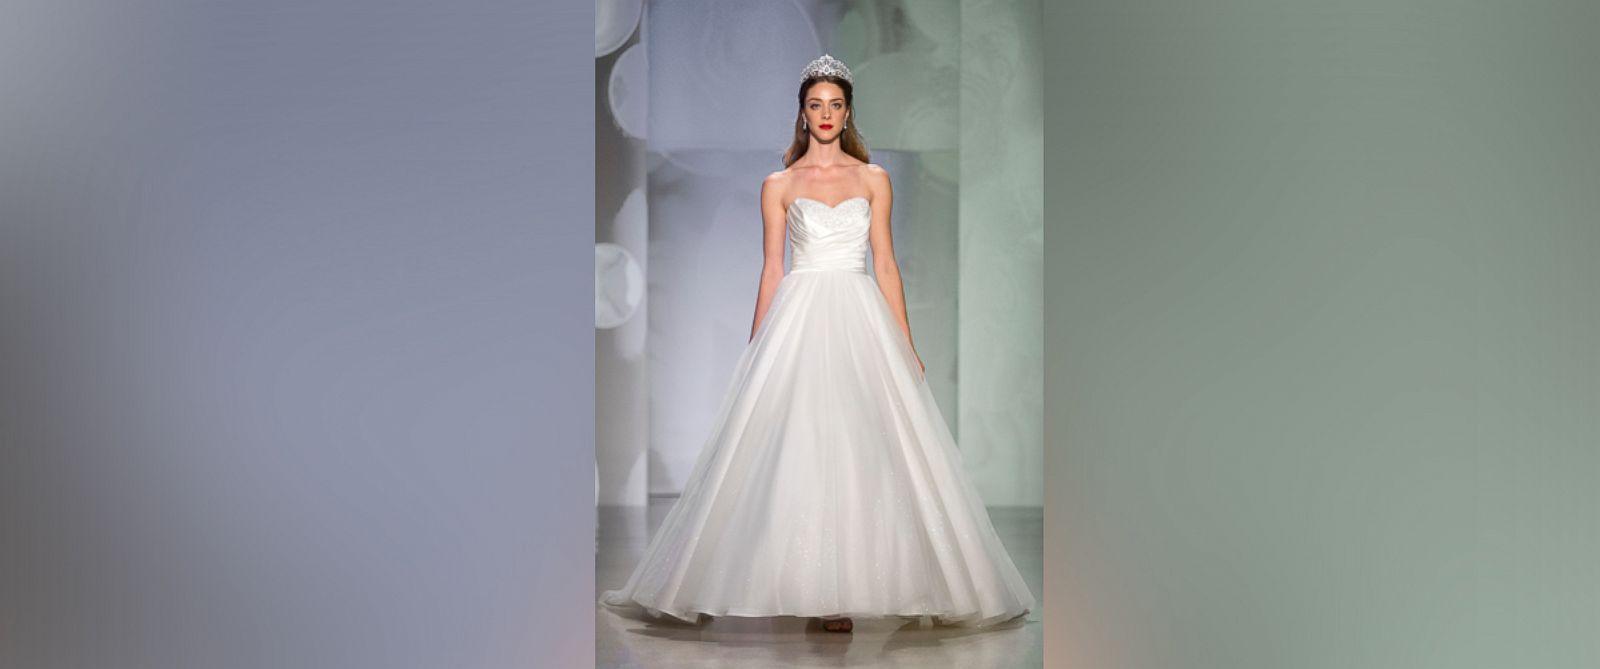 Wedding Disney Princess Wedding Dresses disney reveals new princess wedding dresses abc news photo cinderella anniversary dress play disneys